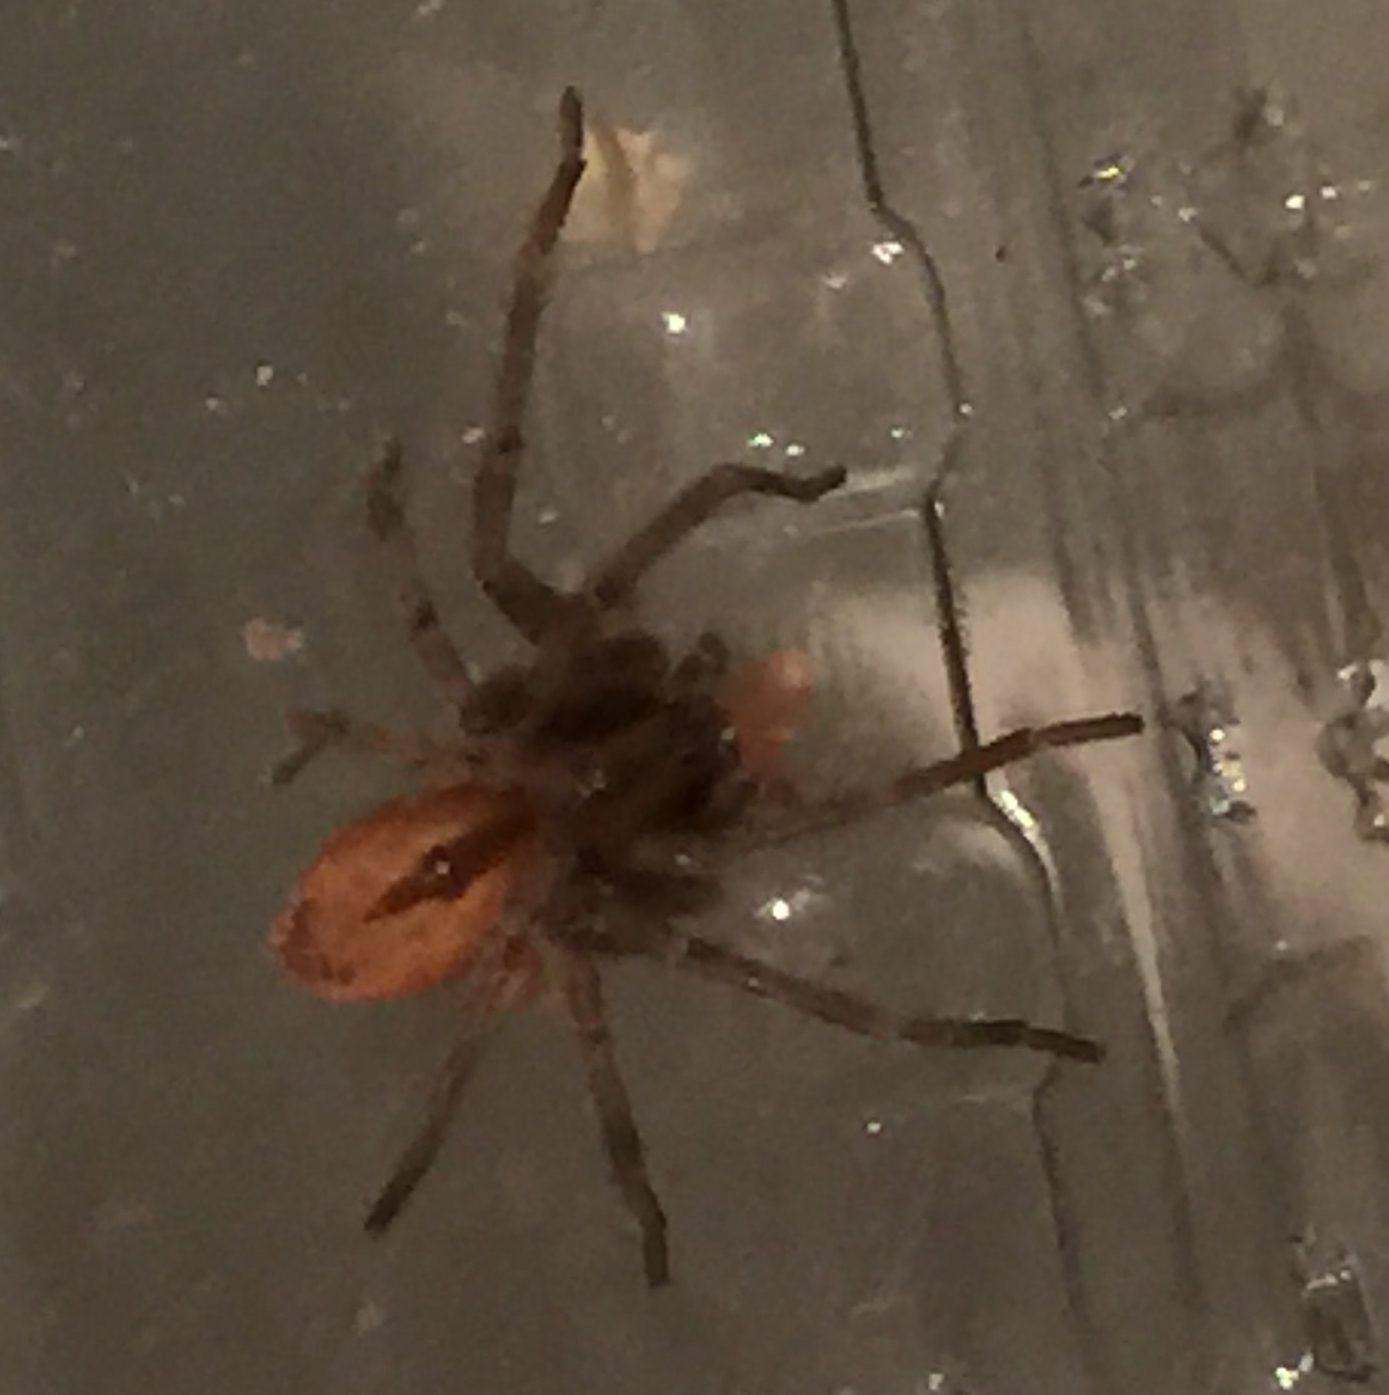 Picture of Thanatus vulgaris (Running Crab Spider) - Dorsal